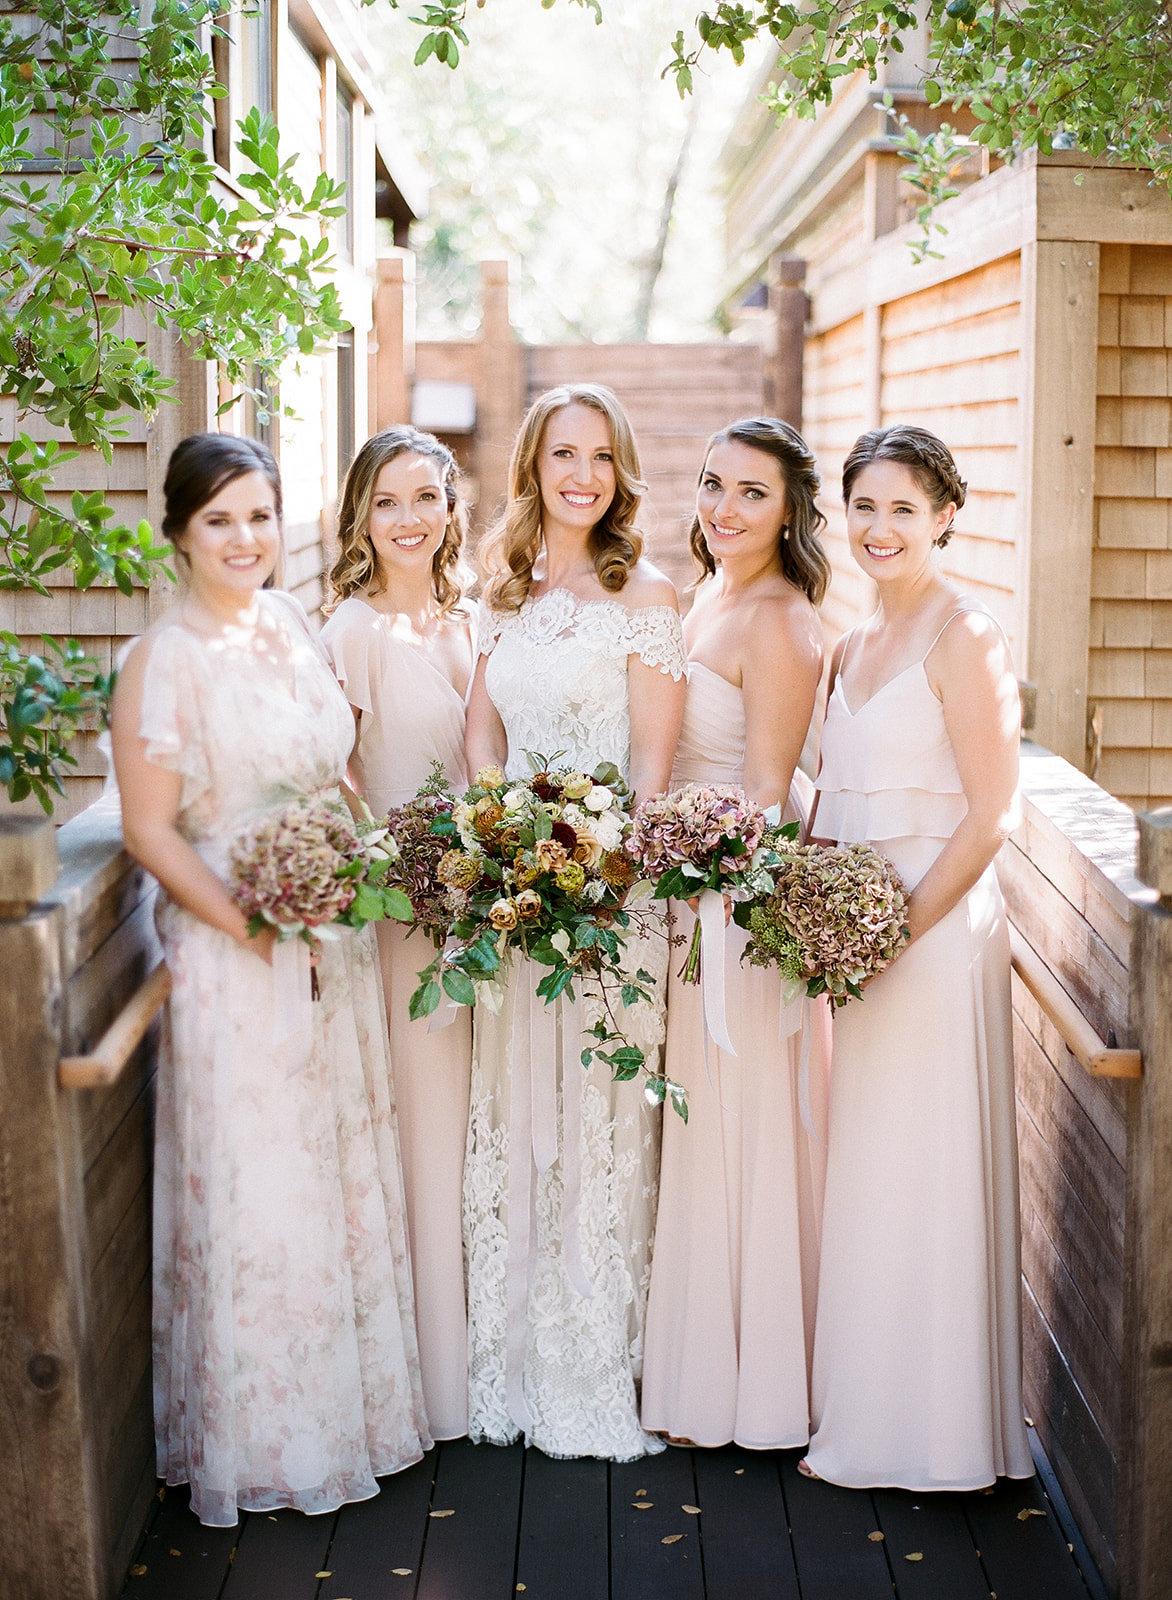 Bridal Party Services